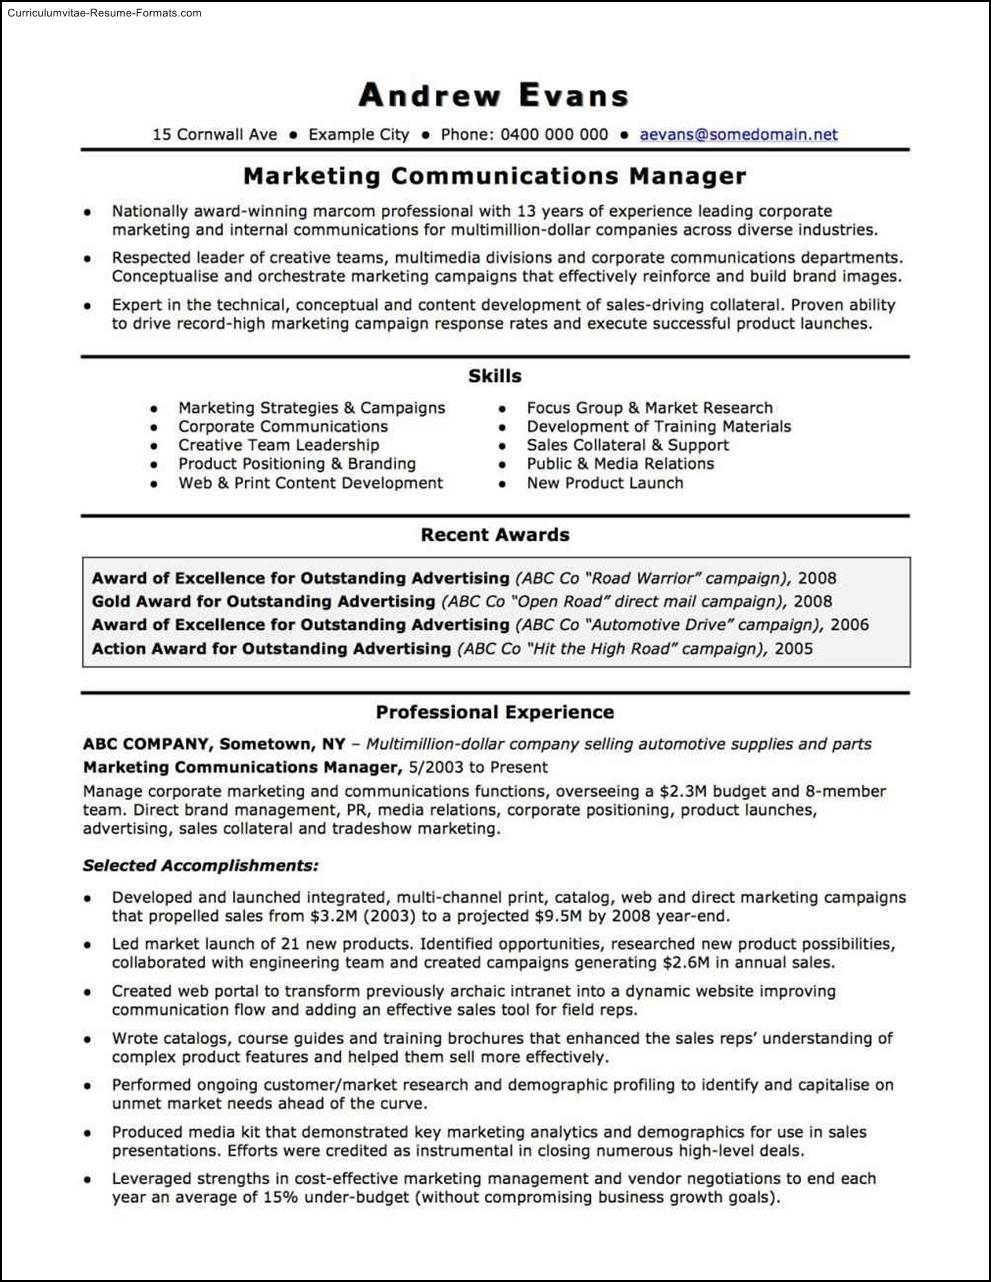 australian resume template